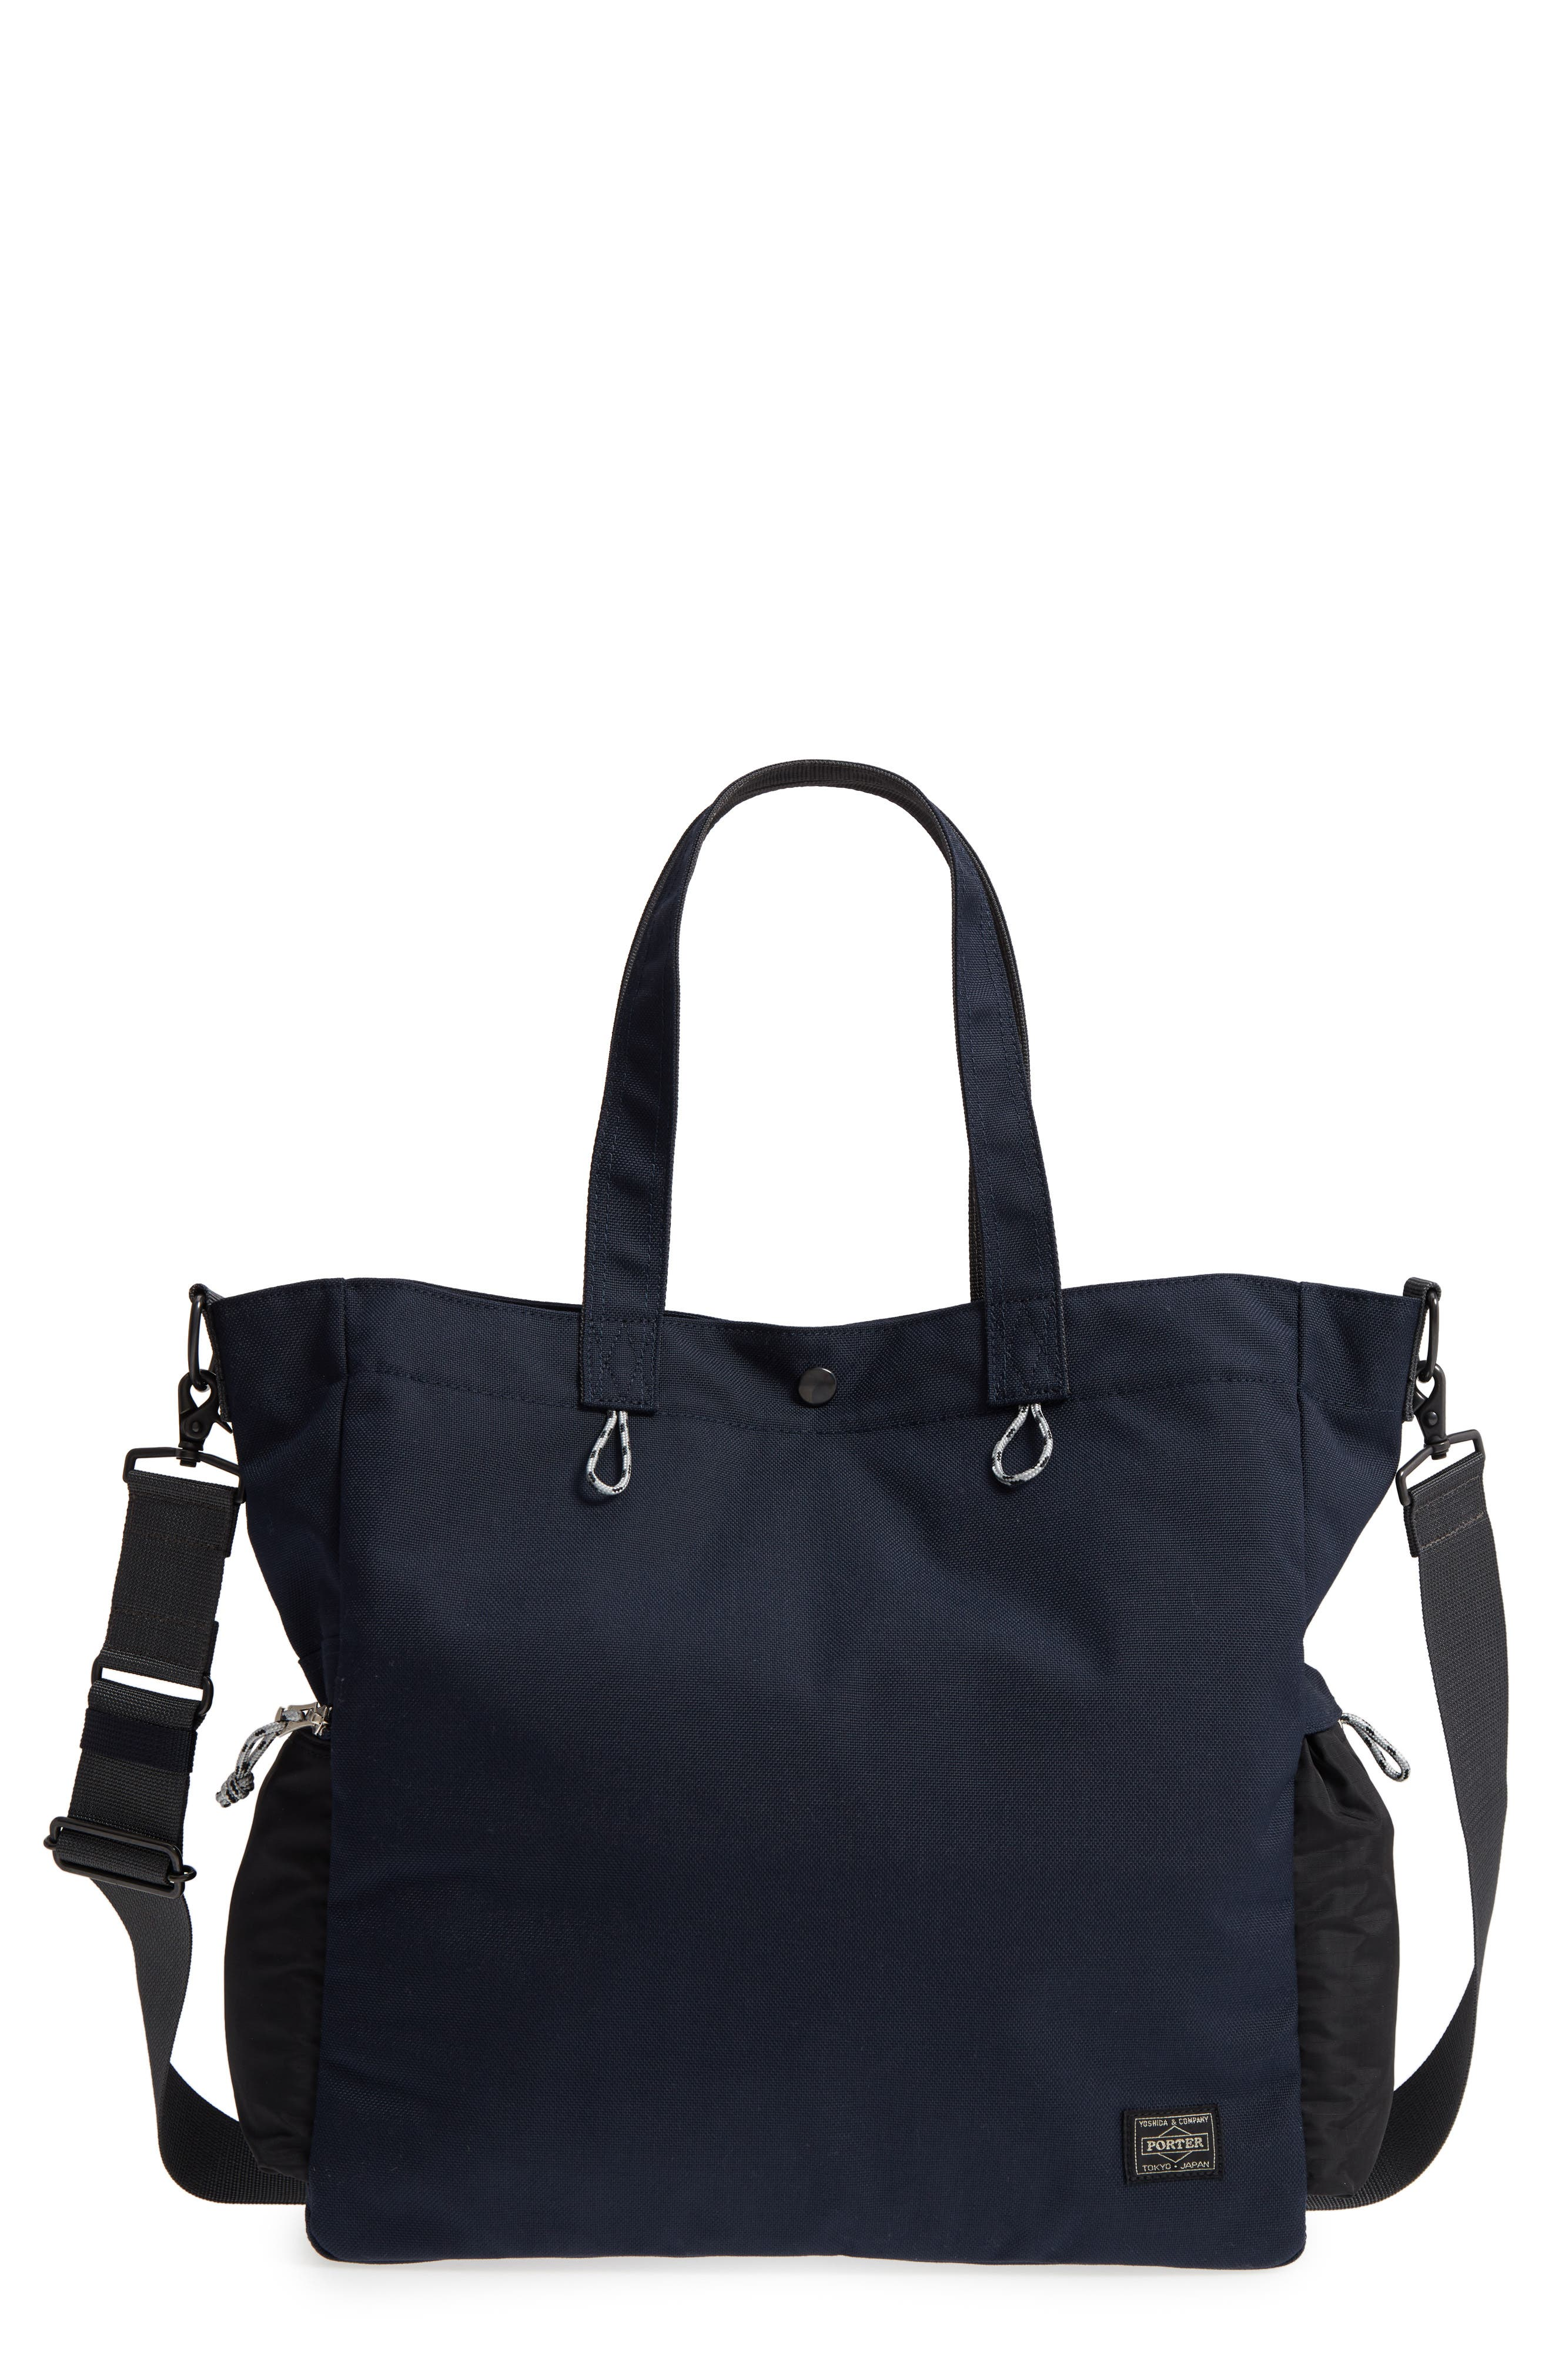 Porter-Yoshida & Co. Hype Tote Bag